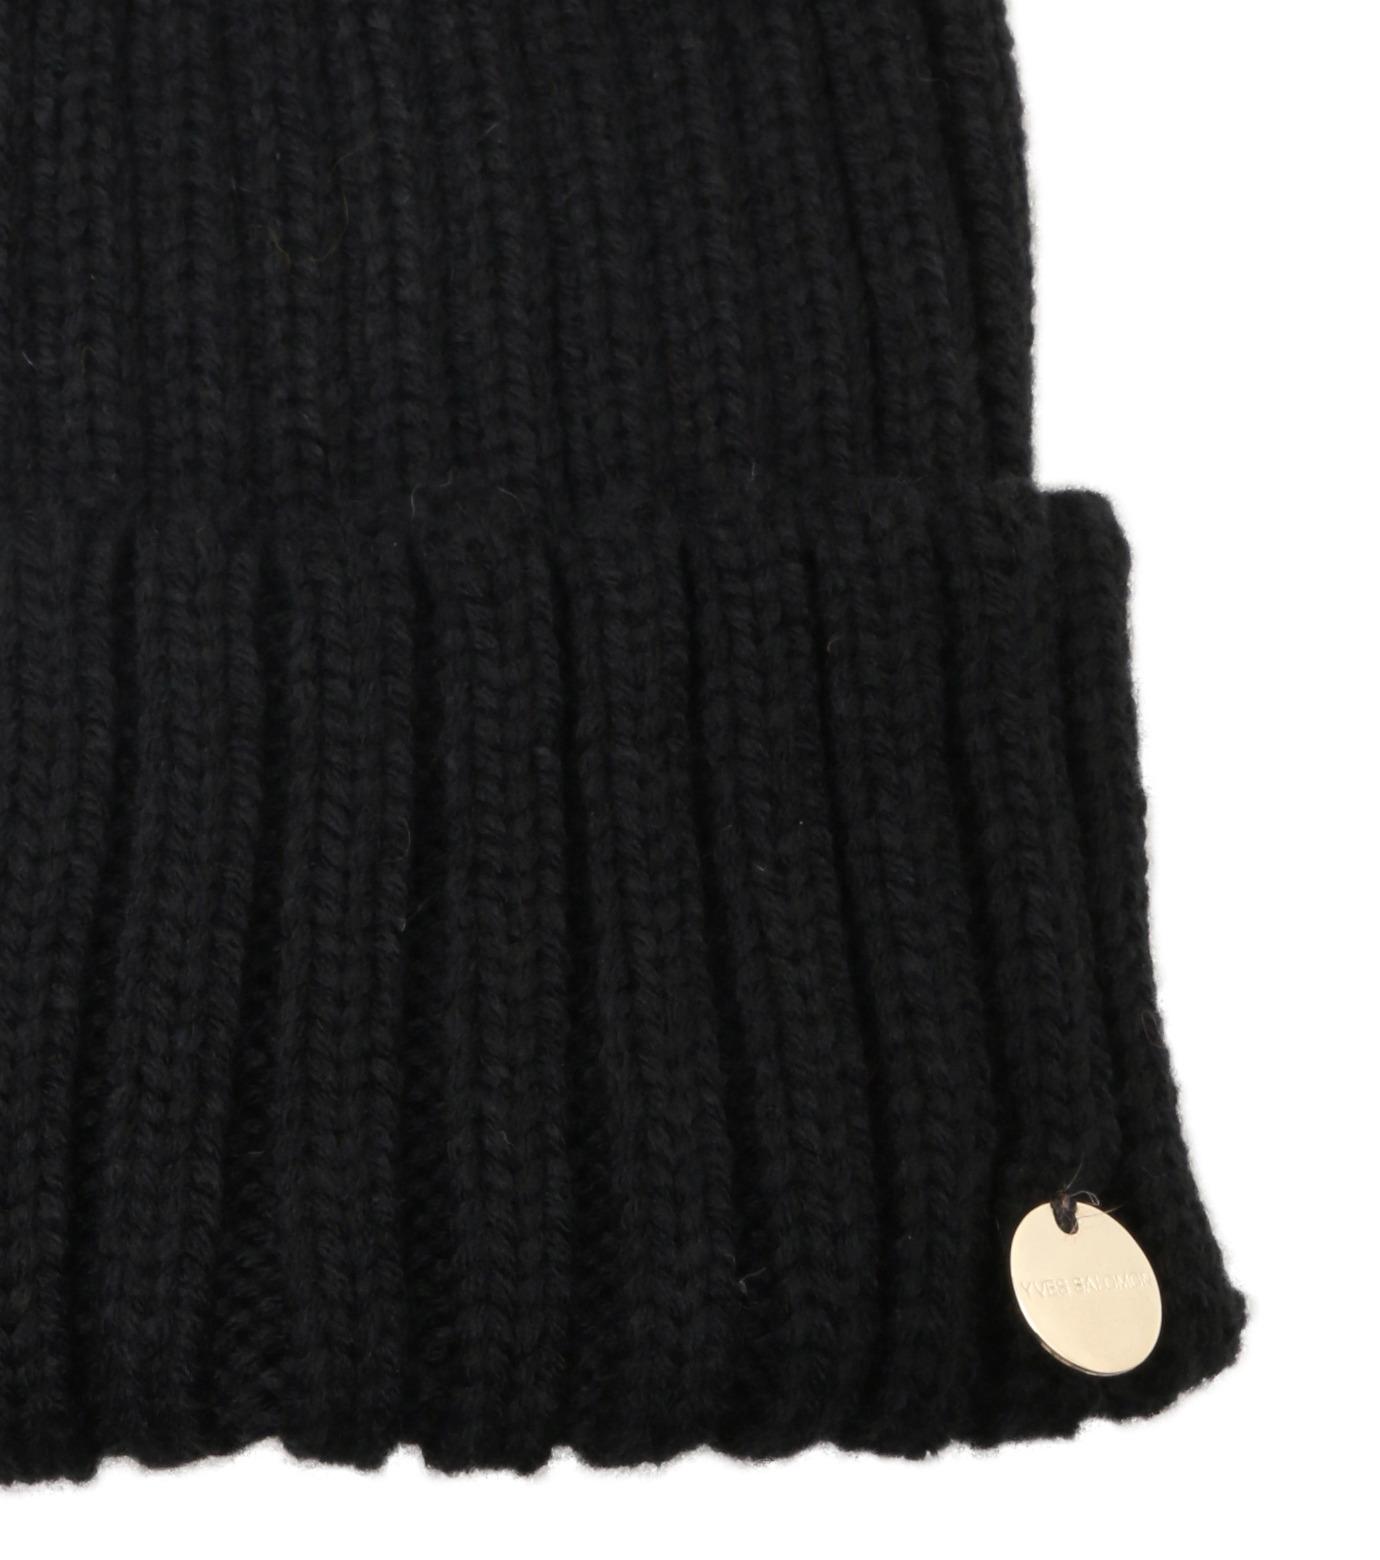 Yves Salomon(イヴ サロモン)のKnit Cap w/Marmotte Fur-BLACK(キャップ/cap)-Y5982XXFCA-13 拡大詳細画像3